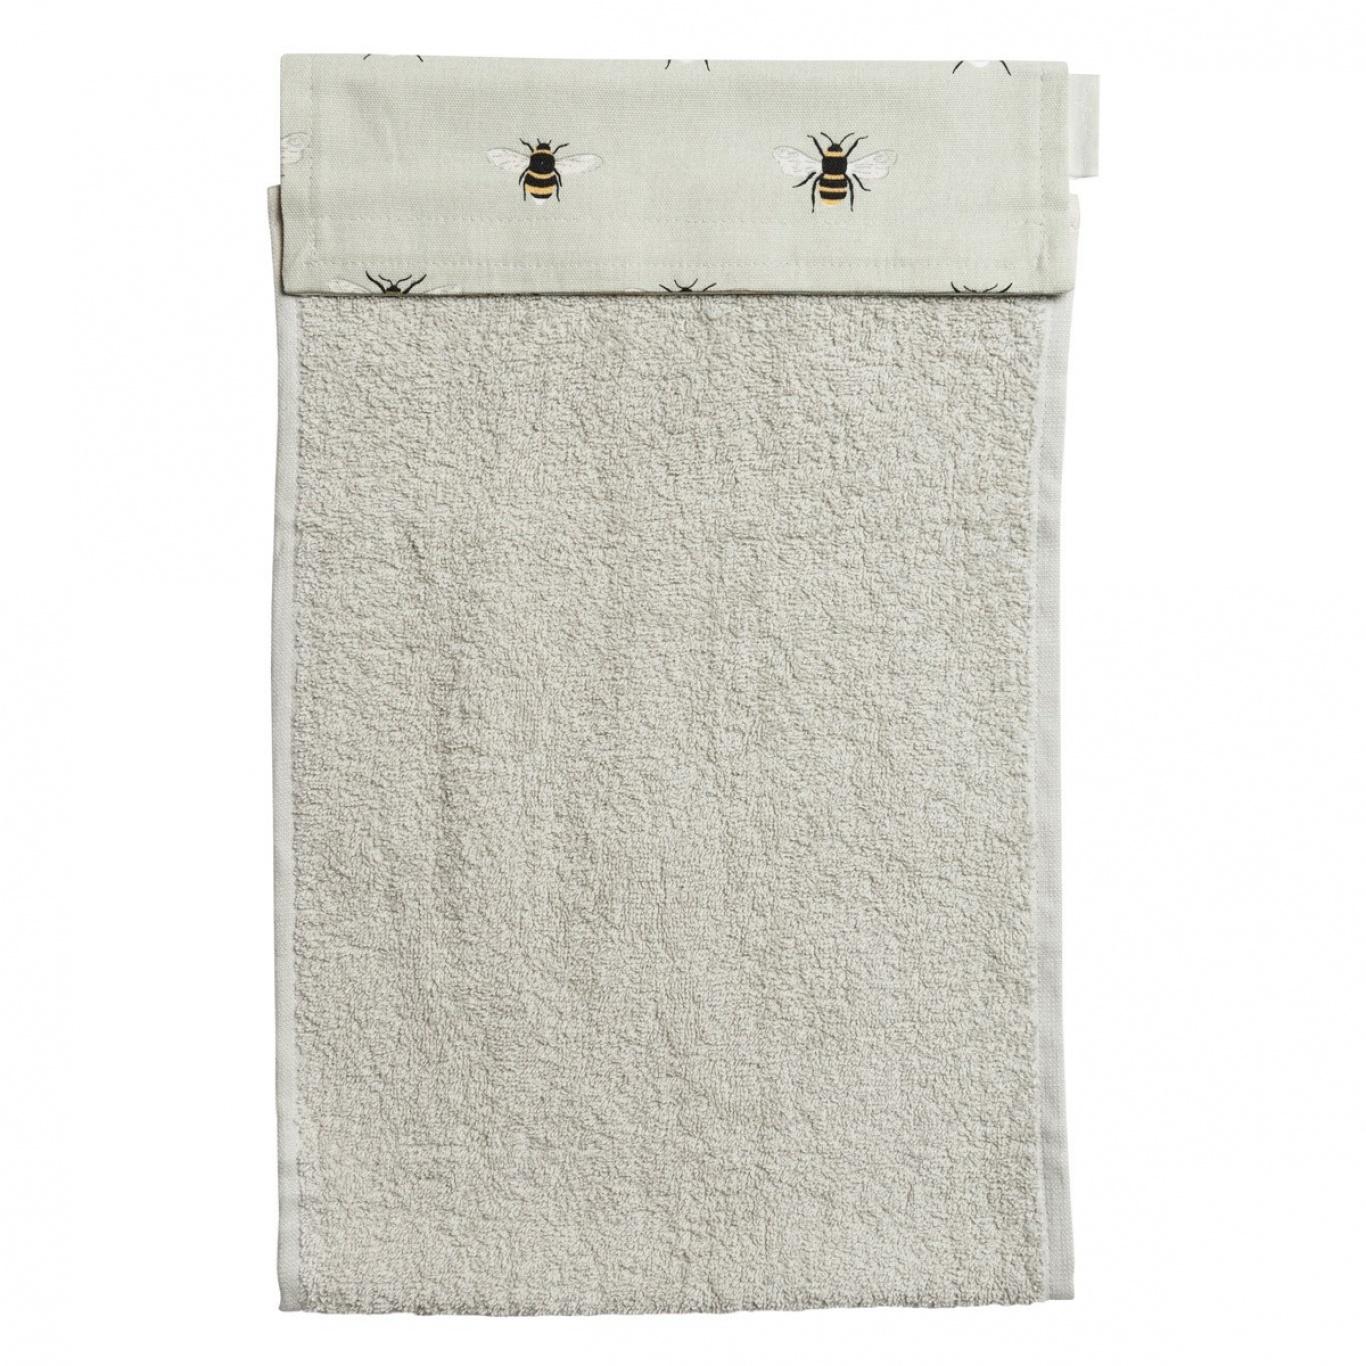 Image of Sophie Allport Bees Roller Hand Towel